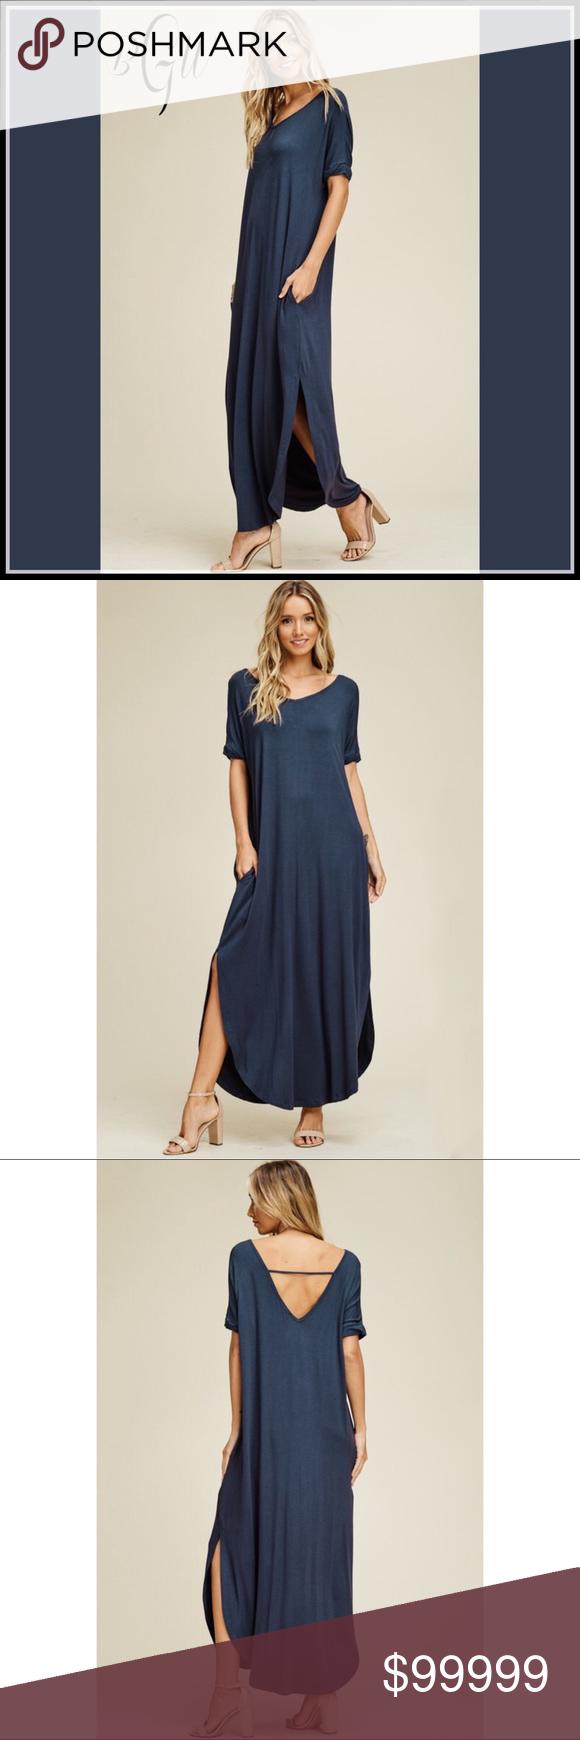 Cs Comfy Maxi T Shirt Dress With Side Slits Coming Soon Comfy Maxi T Shirt Dress With Side Slits A Knit Solid T Shirt Comfy Maxi Maxi Tshirt Dress Dresses [ 1740 x 580 Pixel ]